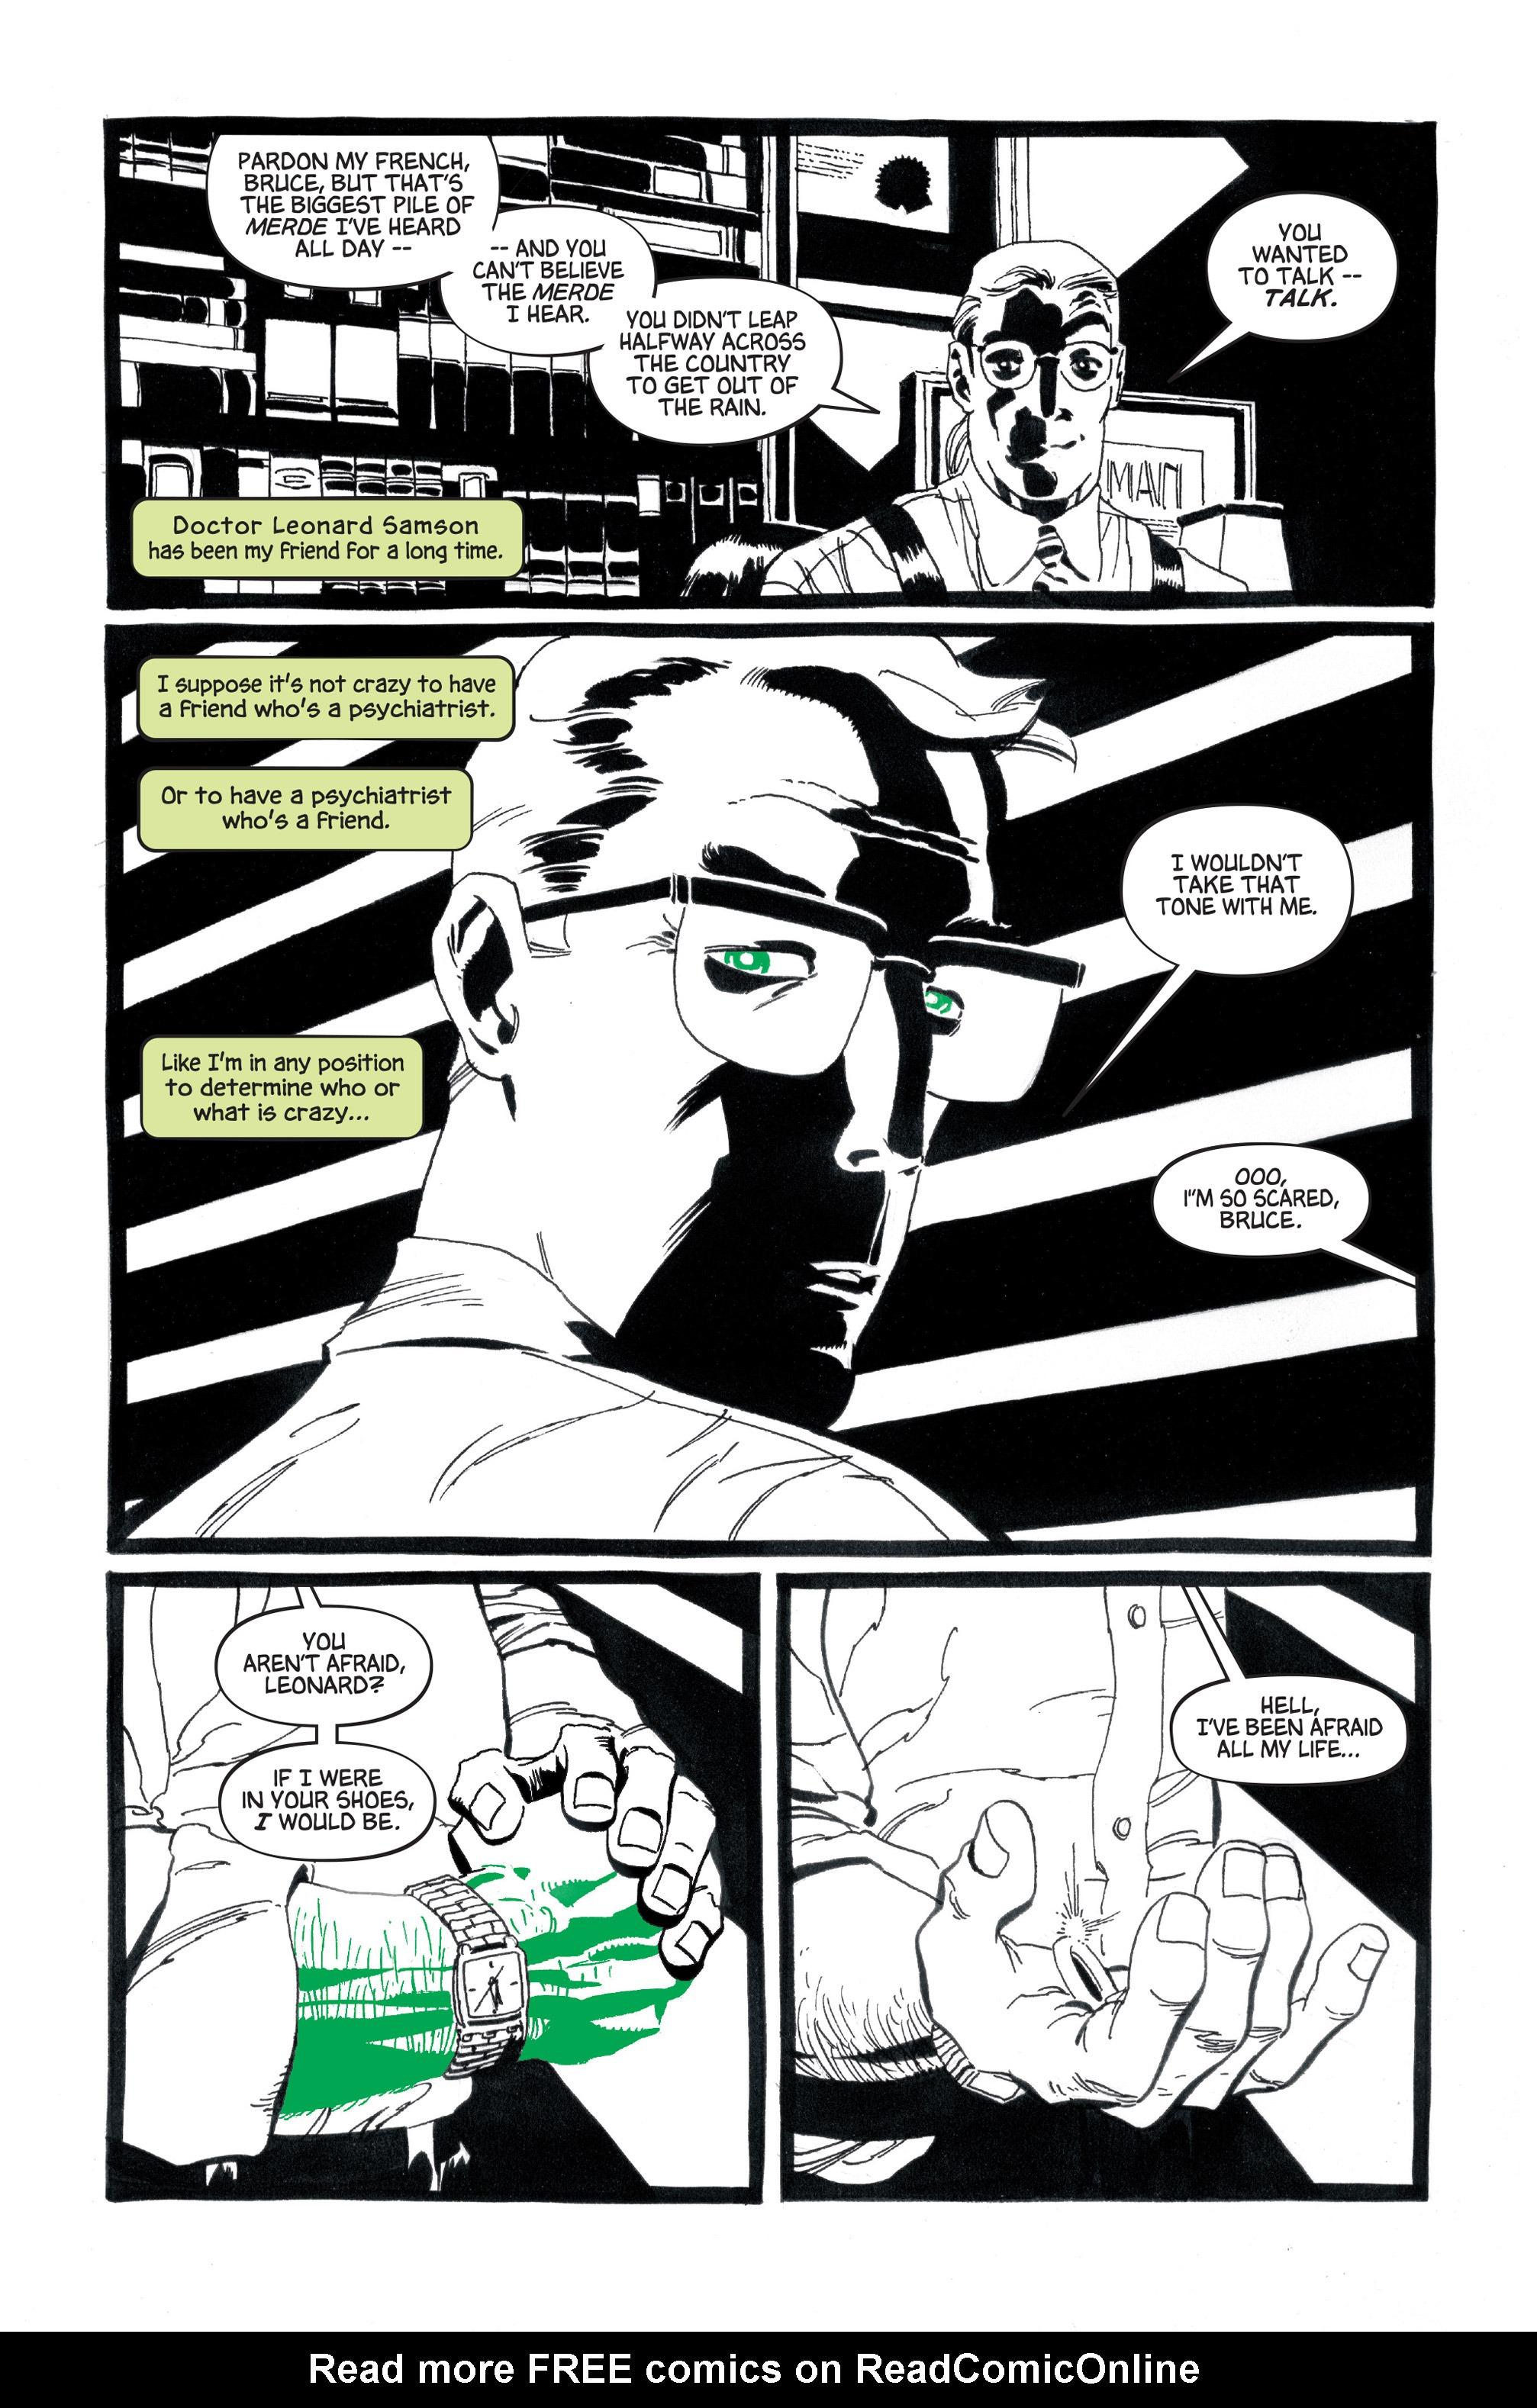 Read online Hulk: Gray comic -  Issue #1 - 5